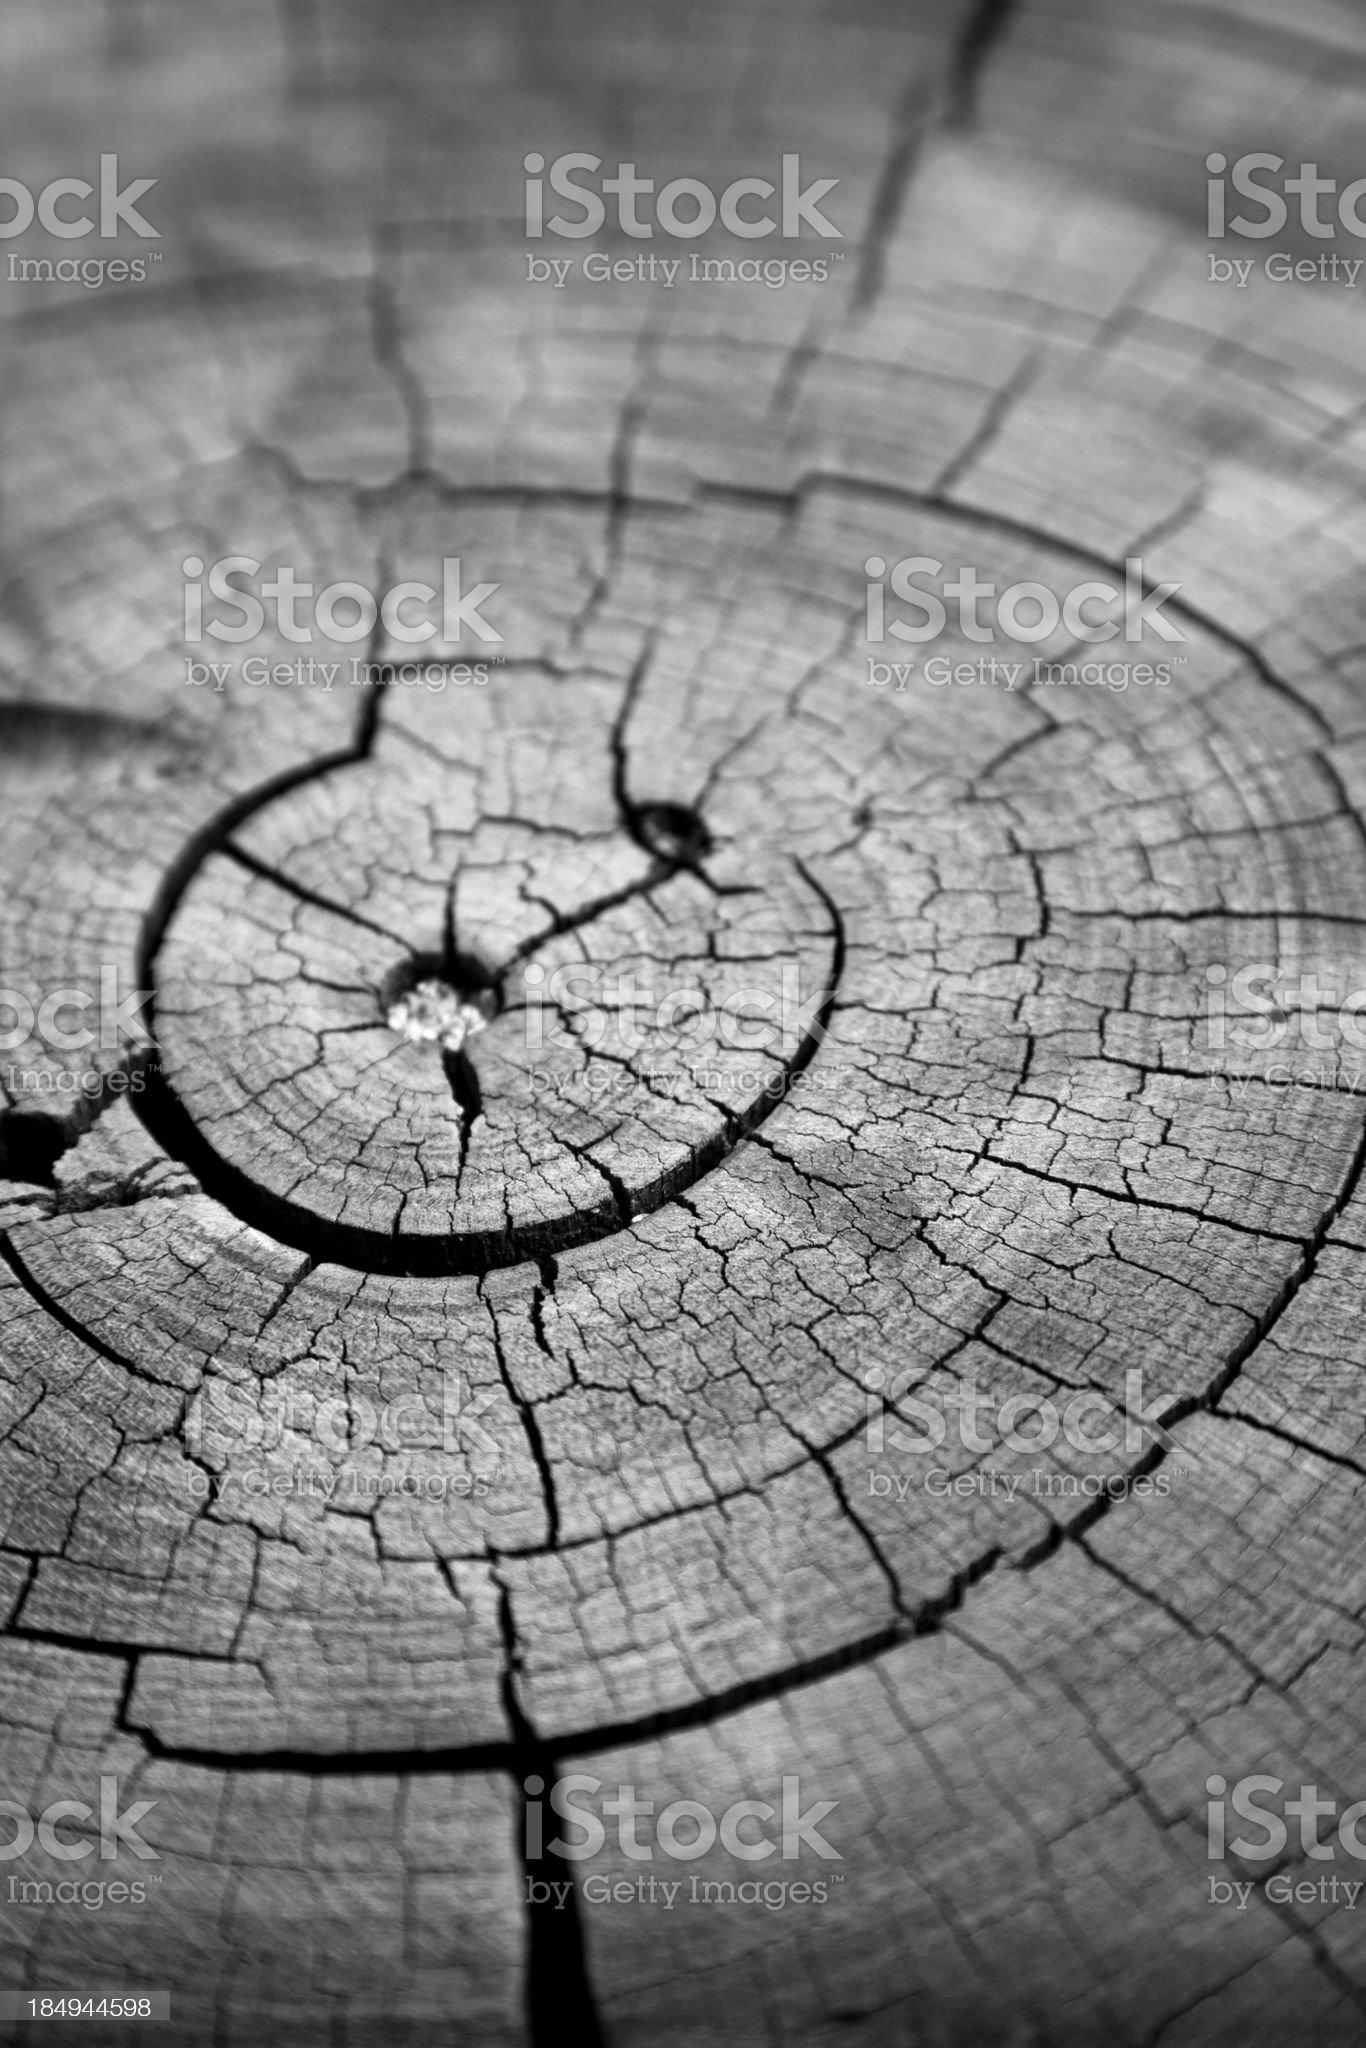 Cracked Tree Rings royalty-free stock photo